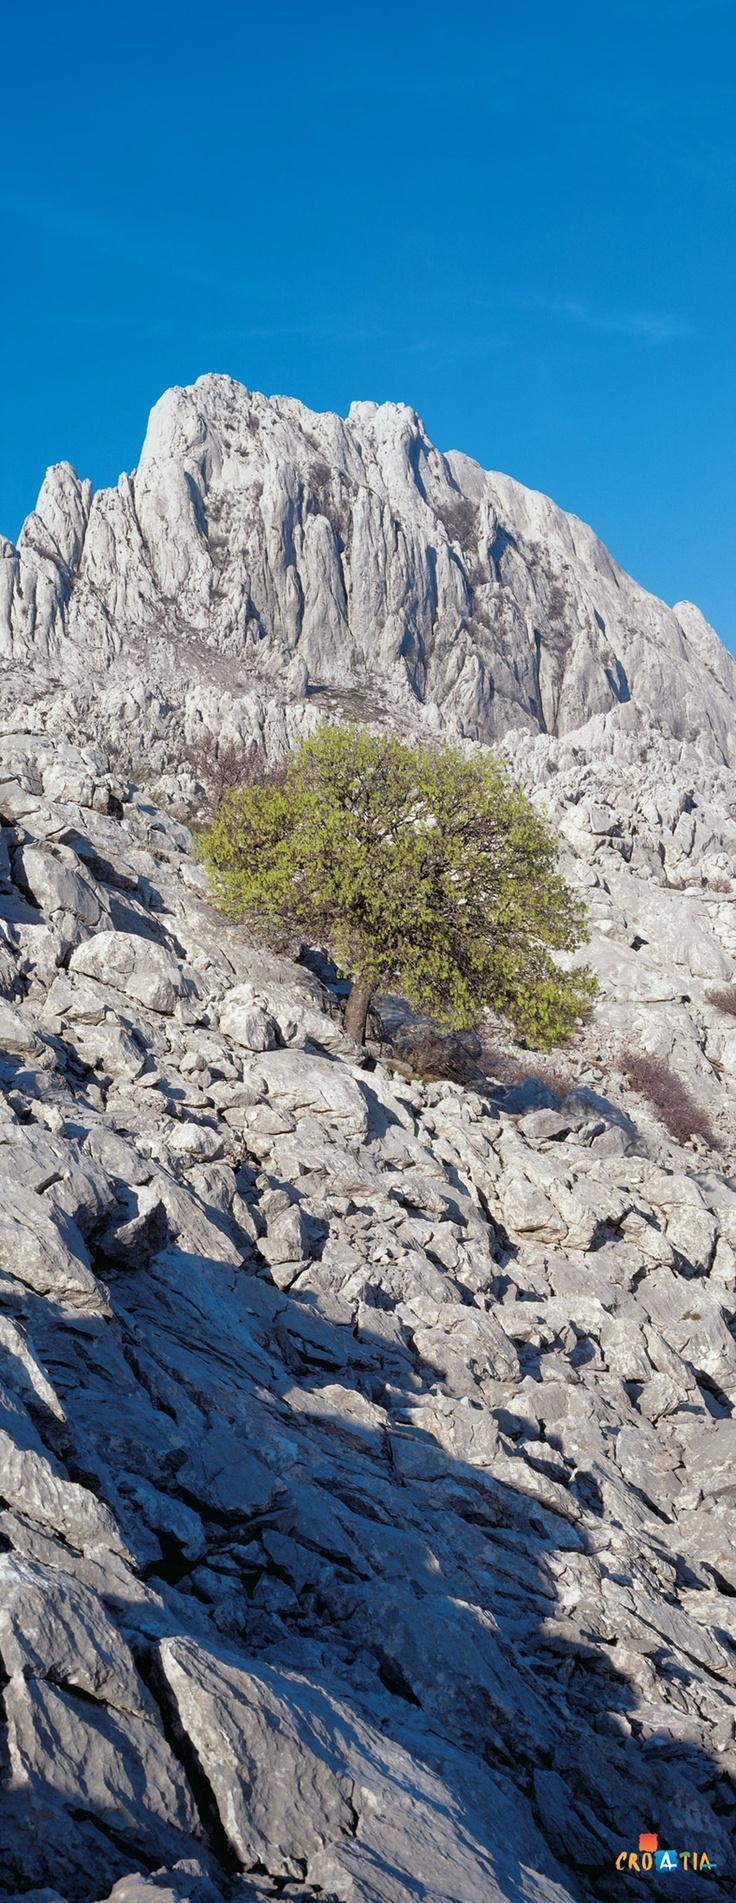 Velebit - the largest  mountain range in Croatia,  / tree in a harsh stone environment #croatia #hrvatska